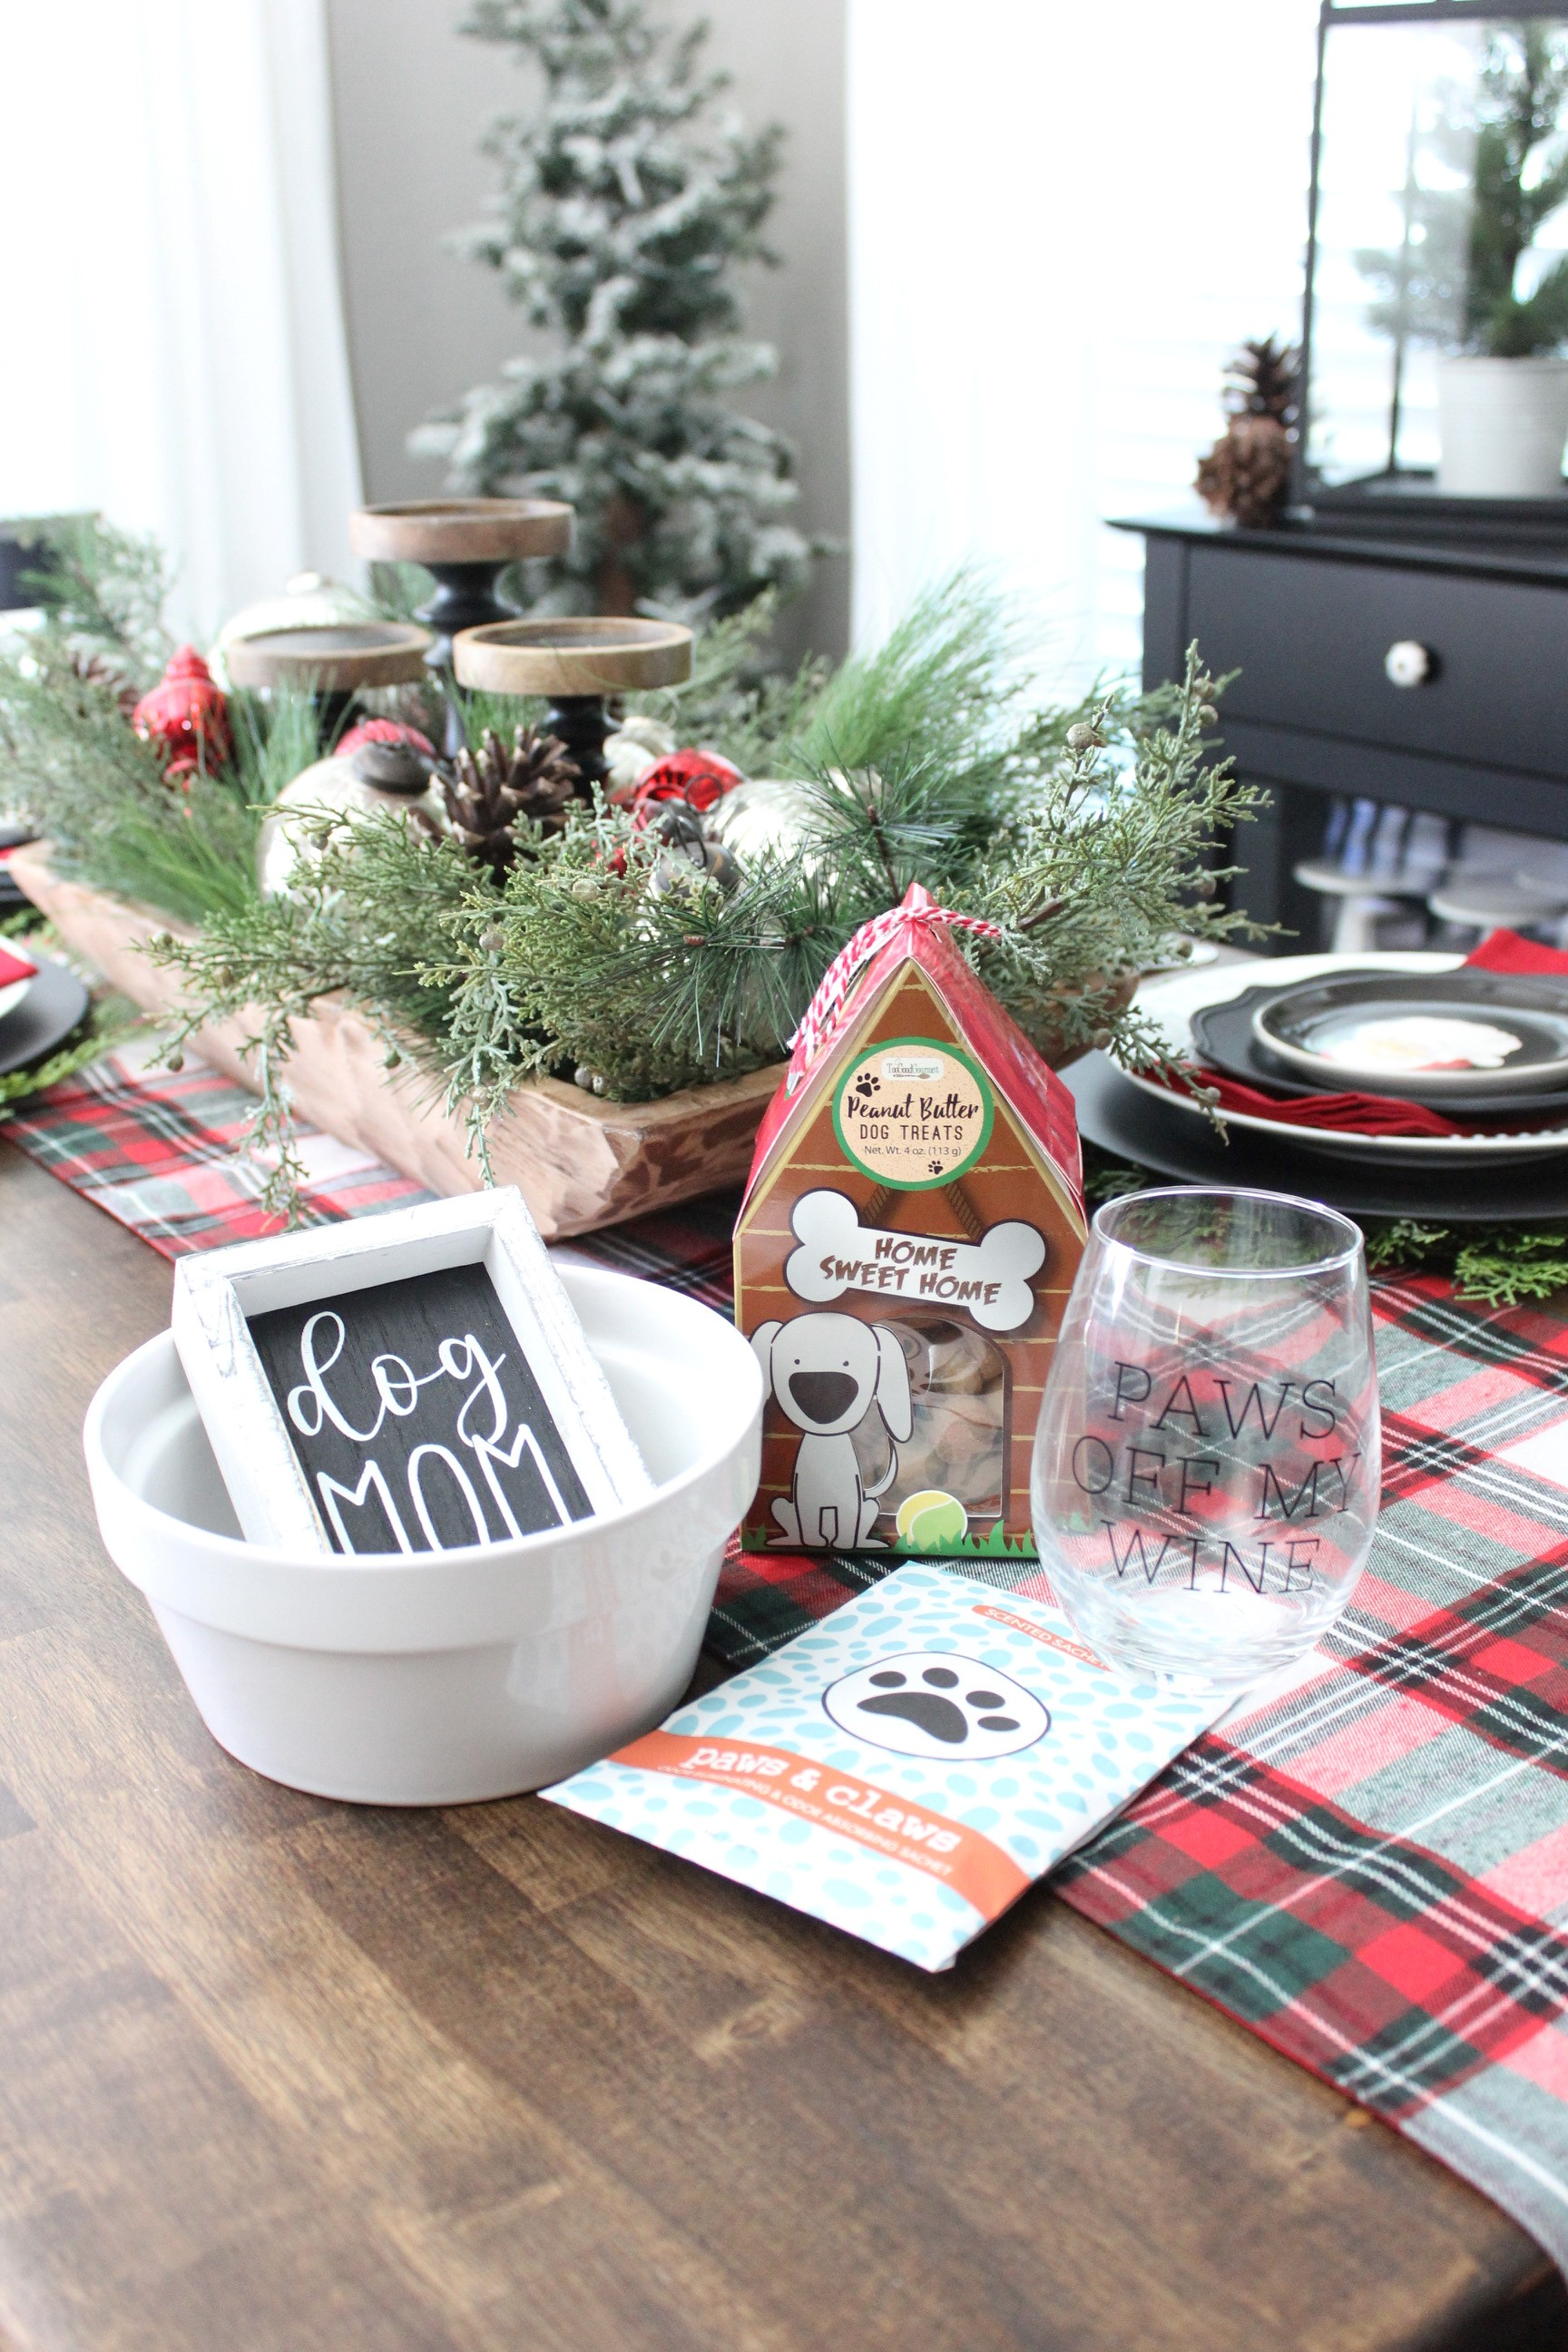 Kirkland's - Gifts for Pet Parents